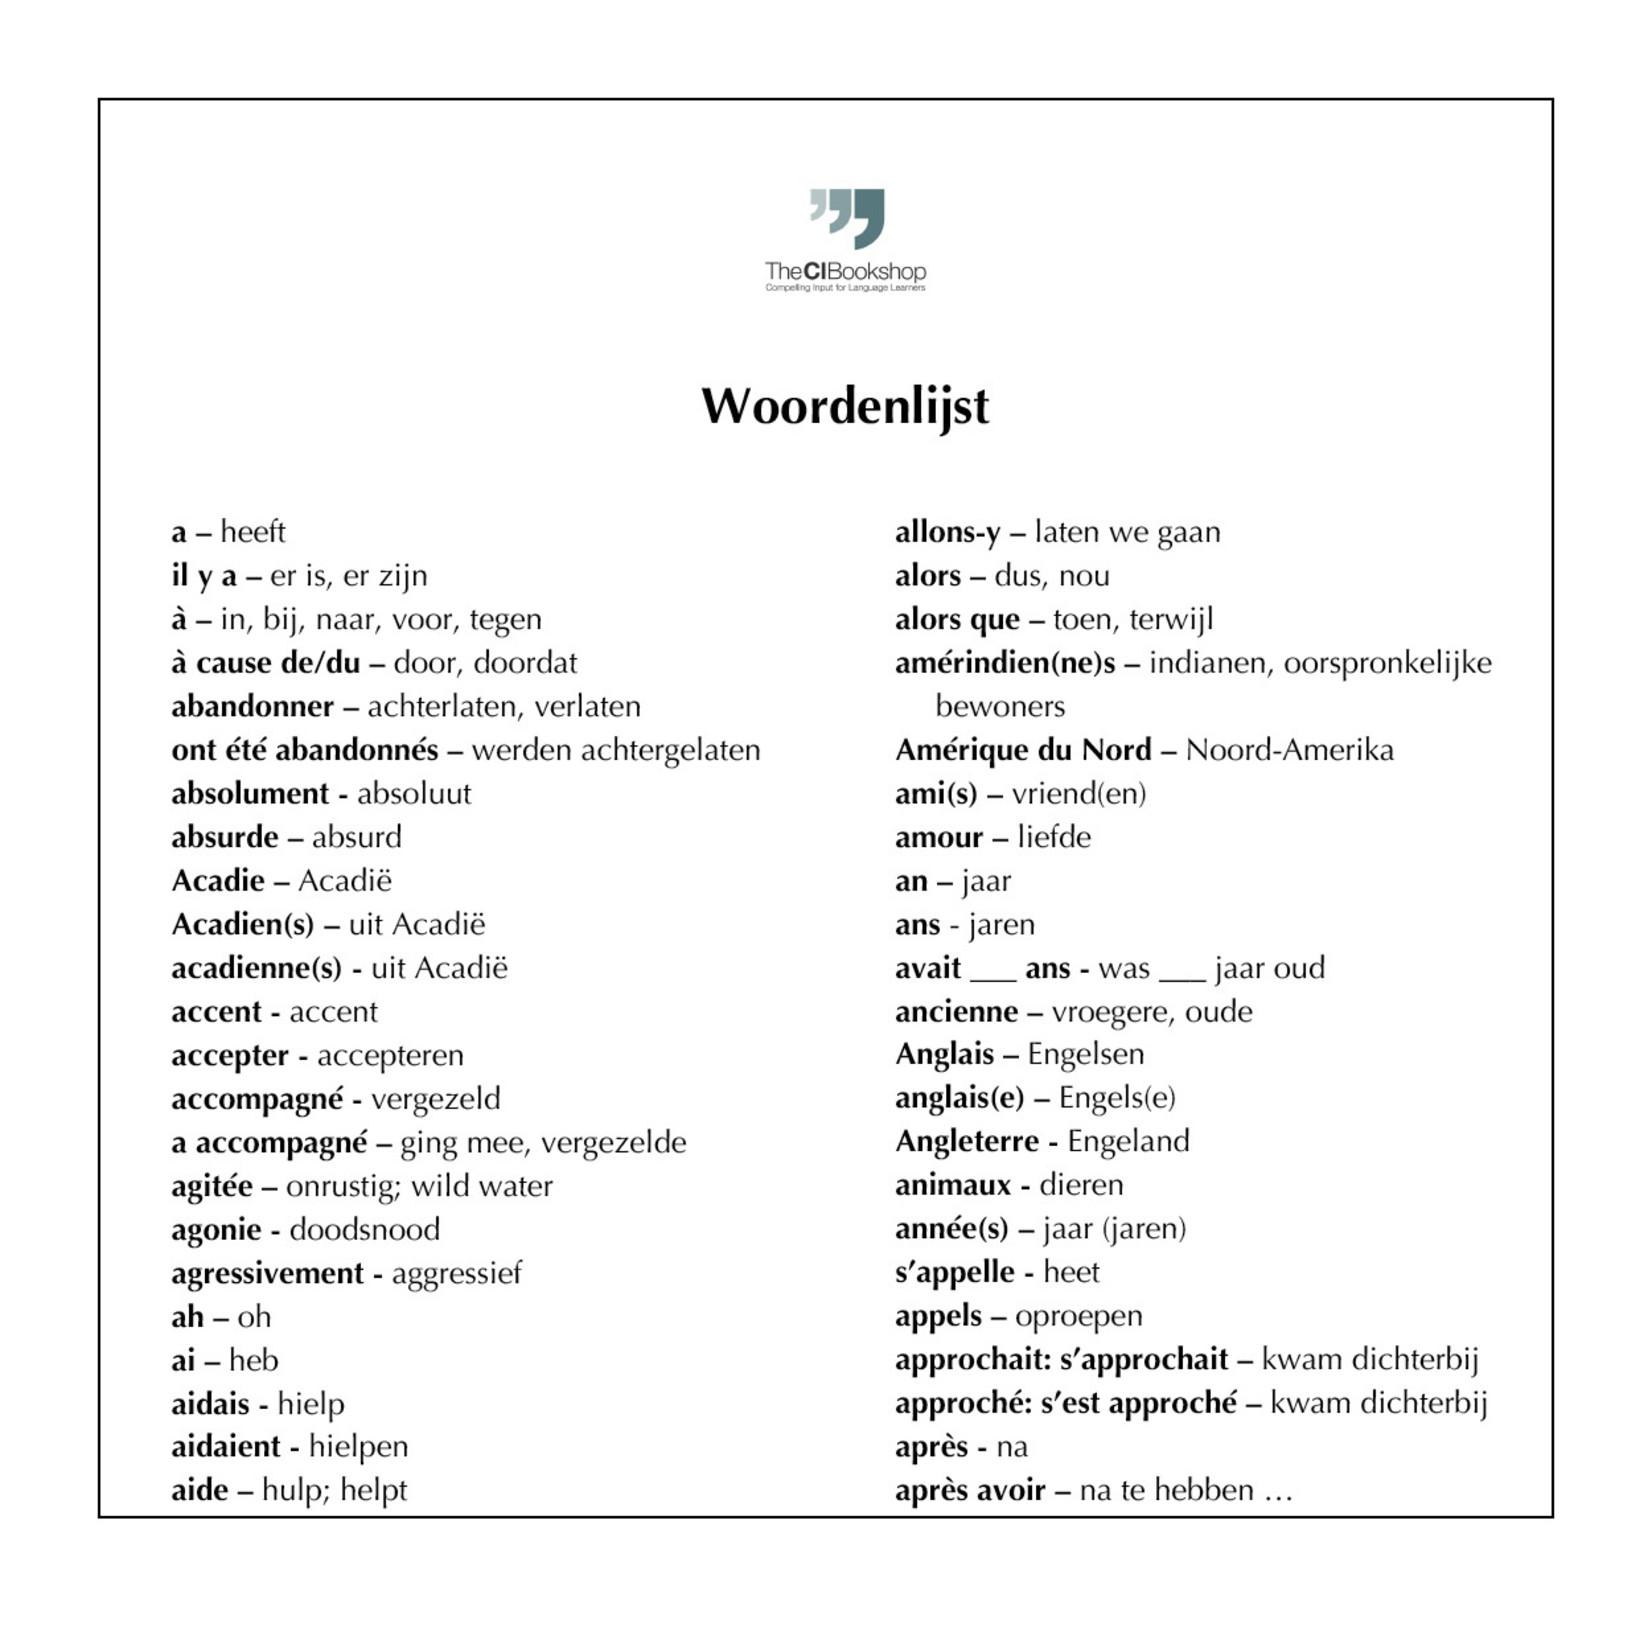 Dutch glossary for Daniel, le détective